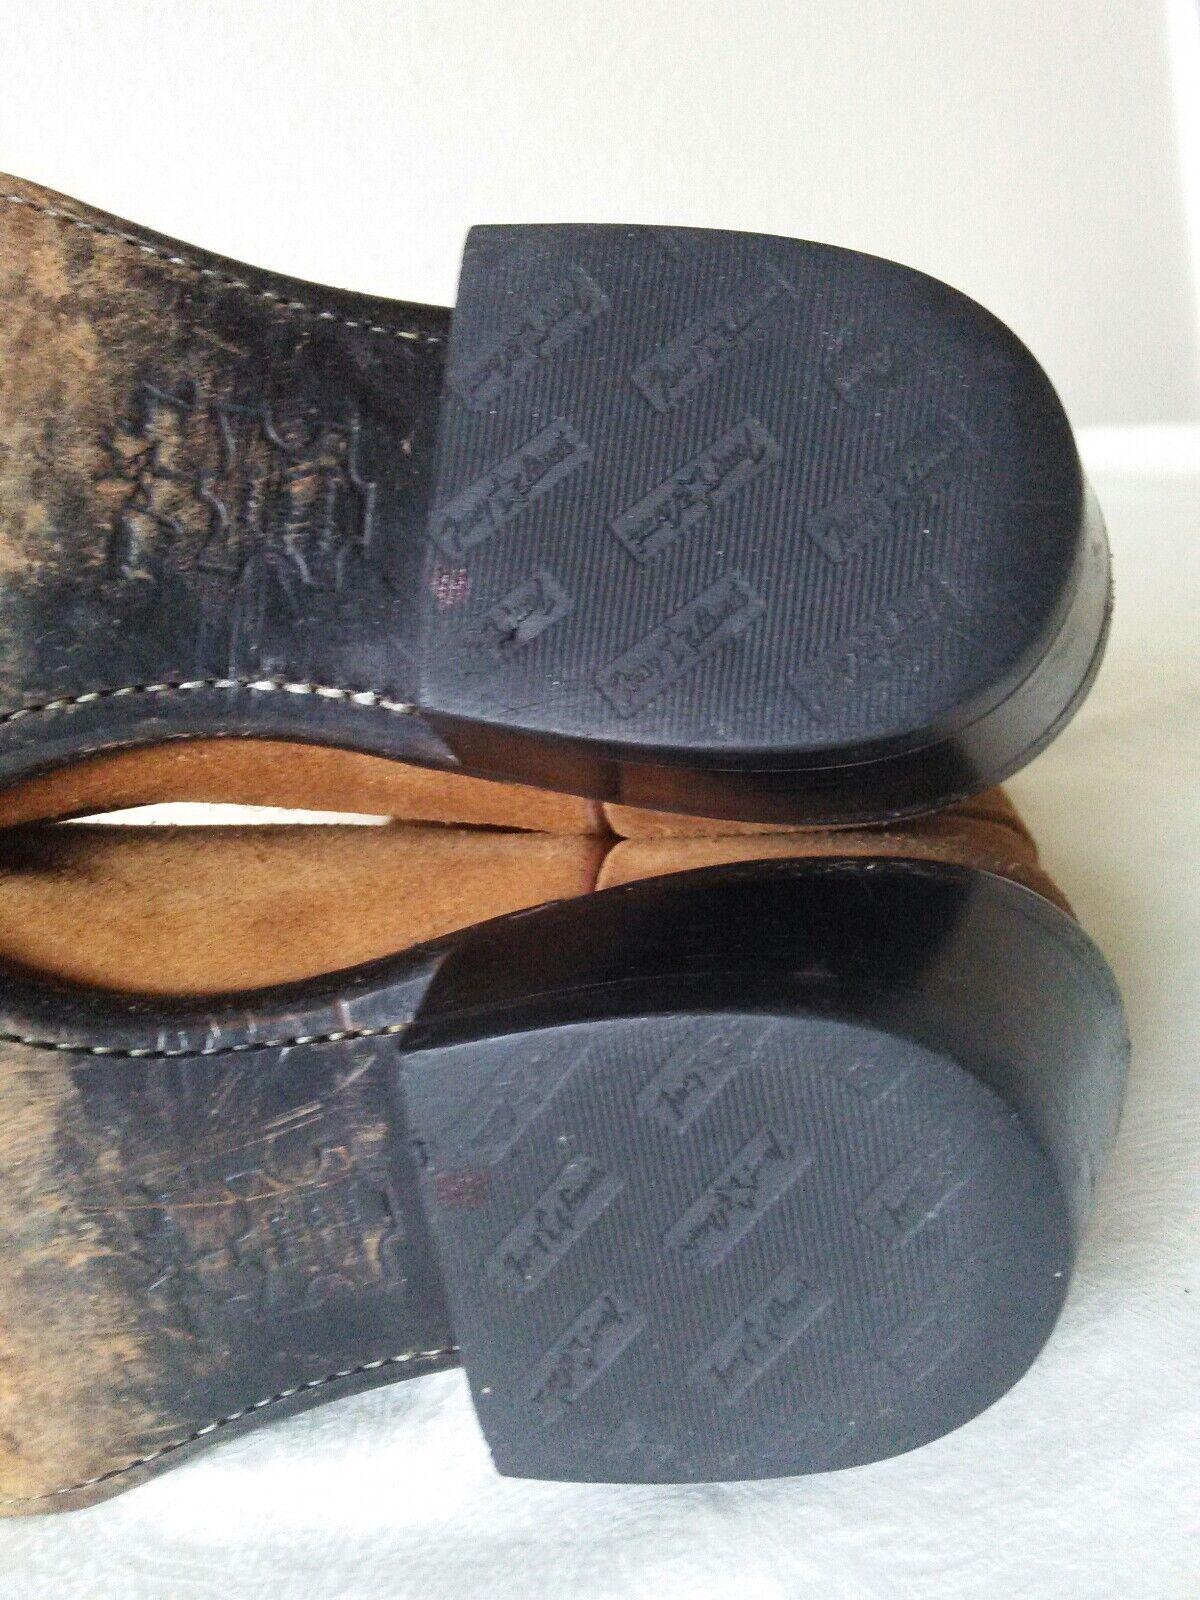 TONY LAMA Chestnut Braun Suede Lady cowboy/western pointed toe boots Größe 7.5 D